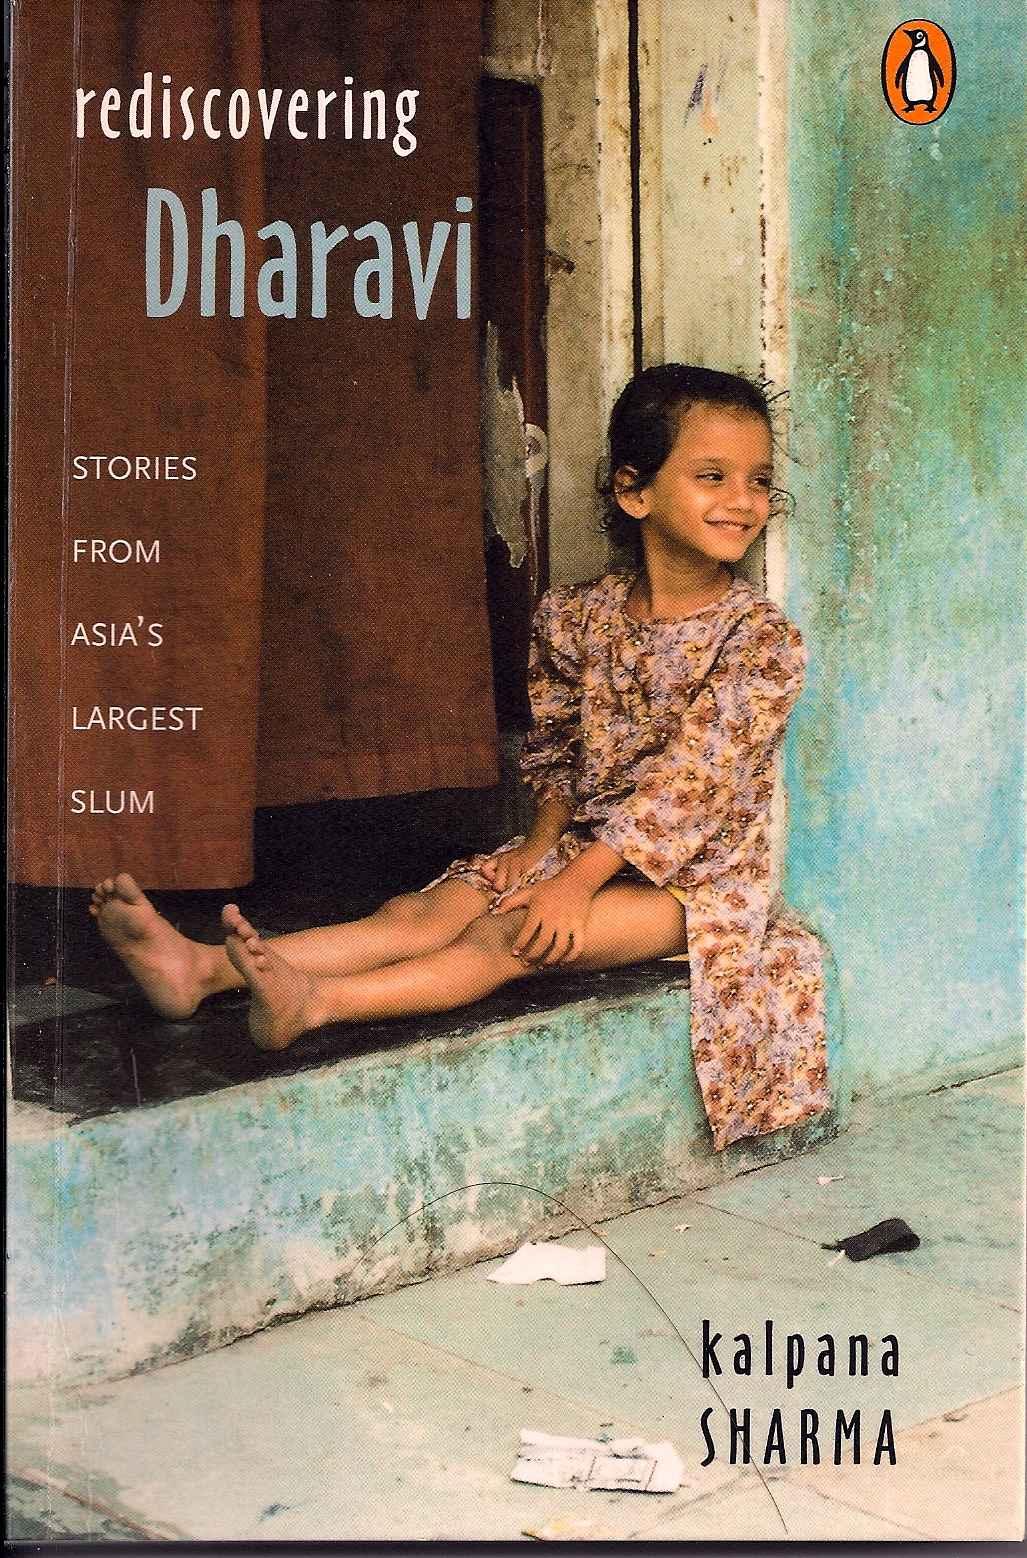 Rediscovering Dharavi